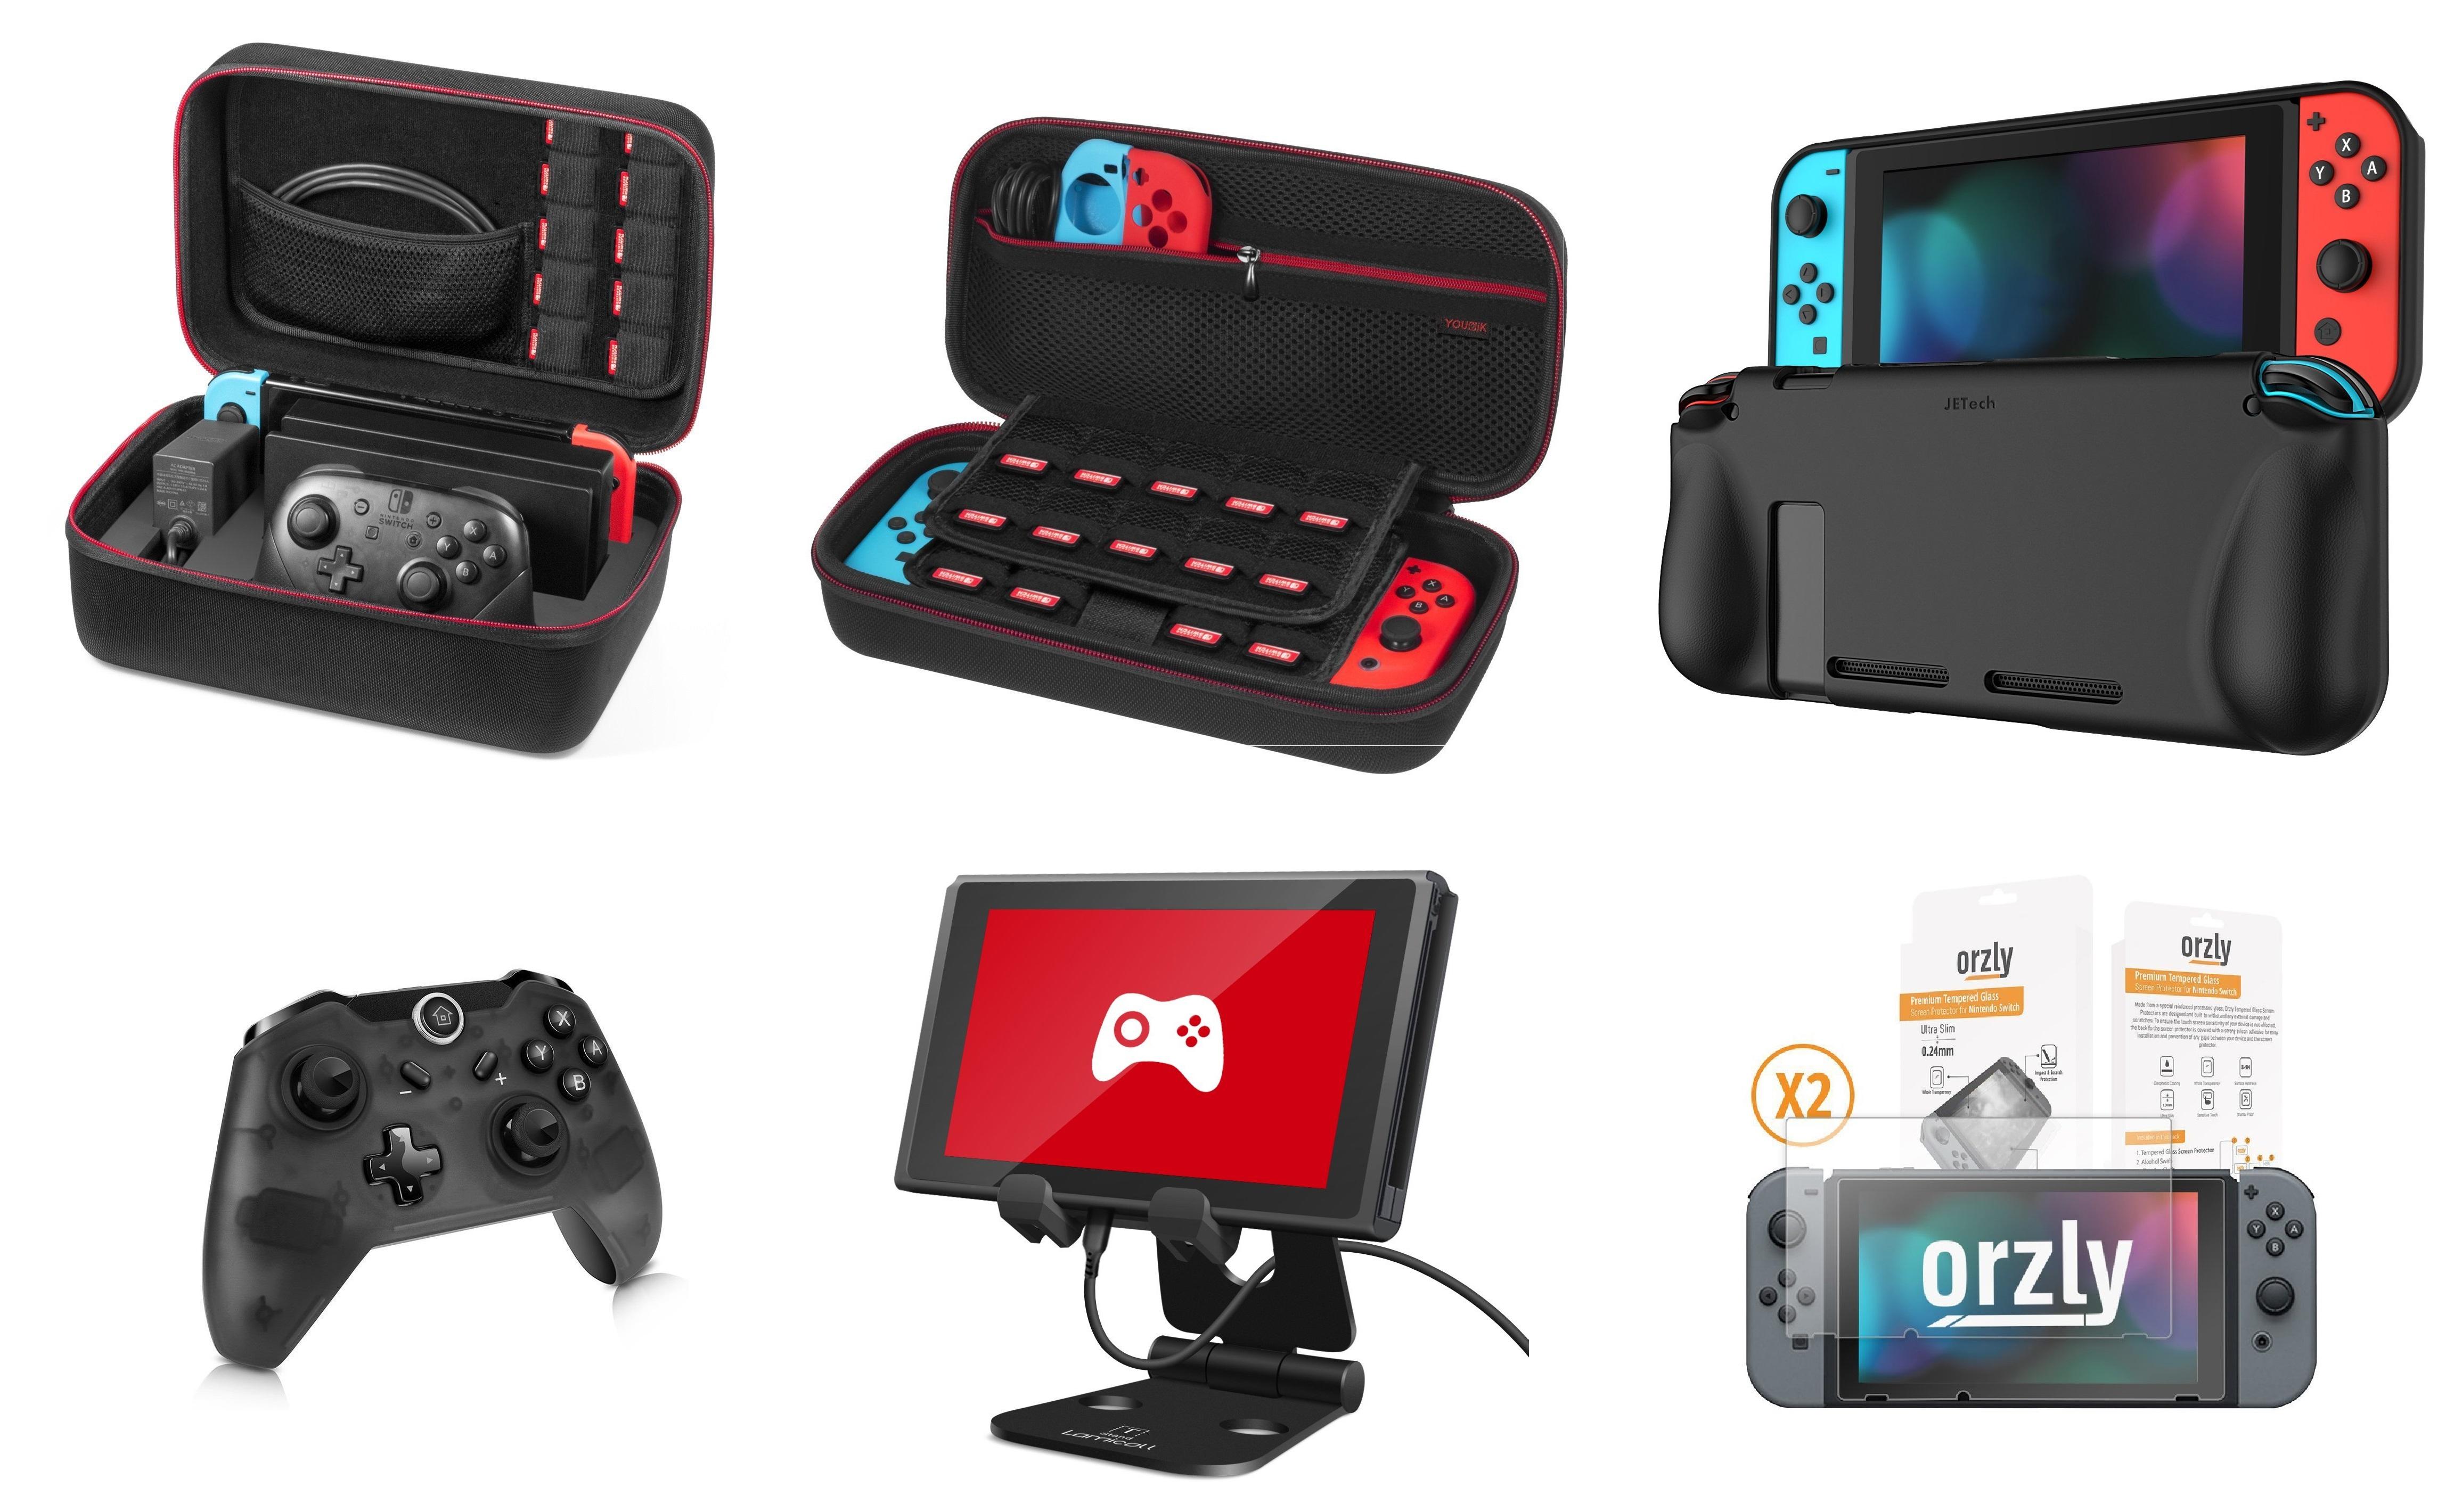 Accesorios Nintendo Switch (ofertas flash)